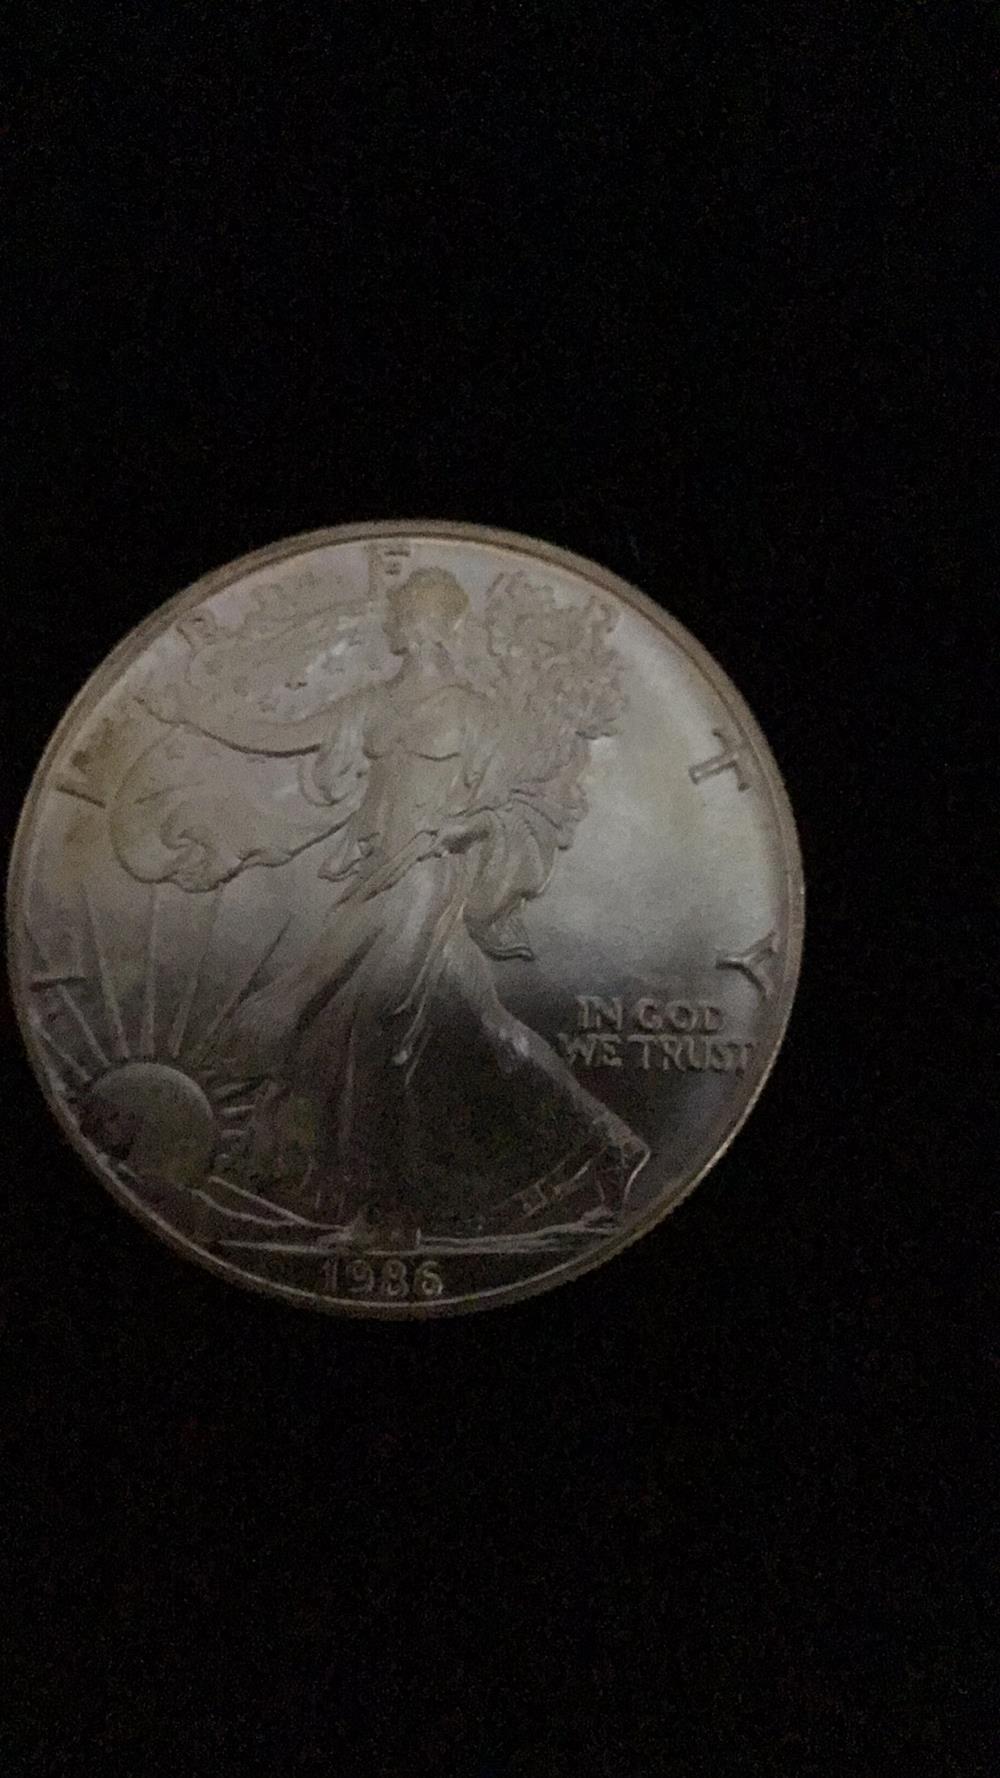 1986 American eagle